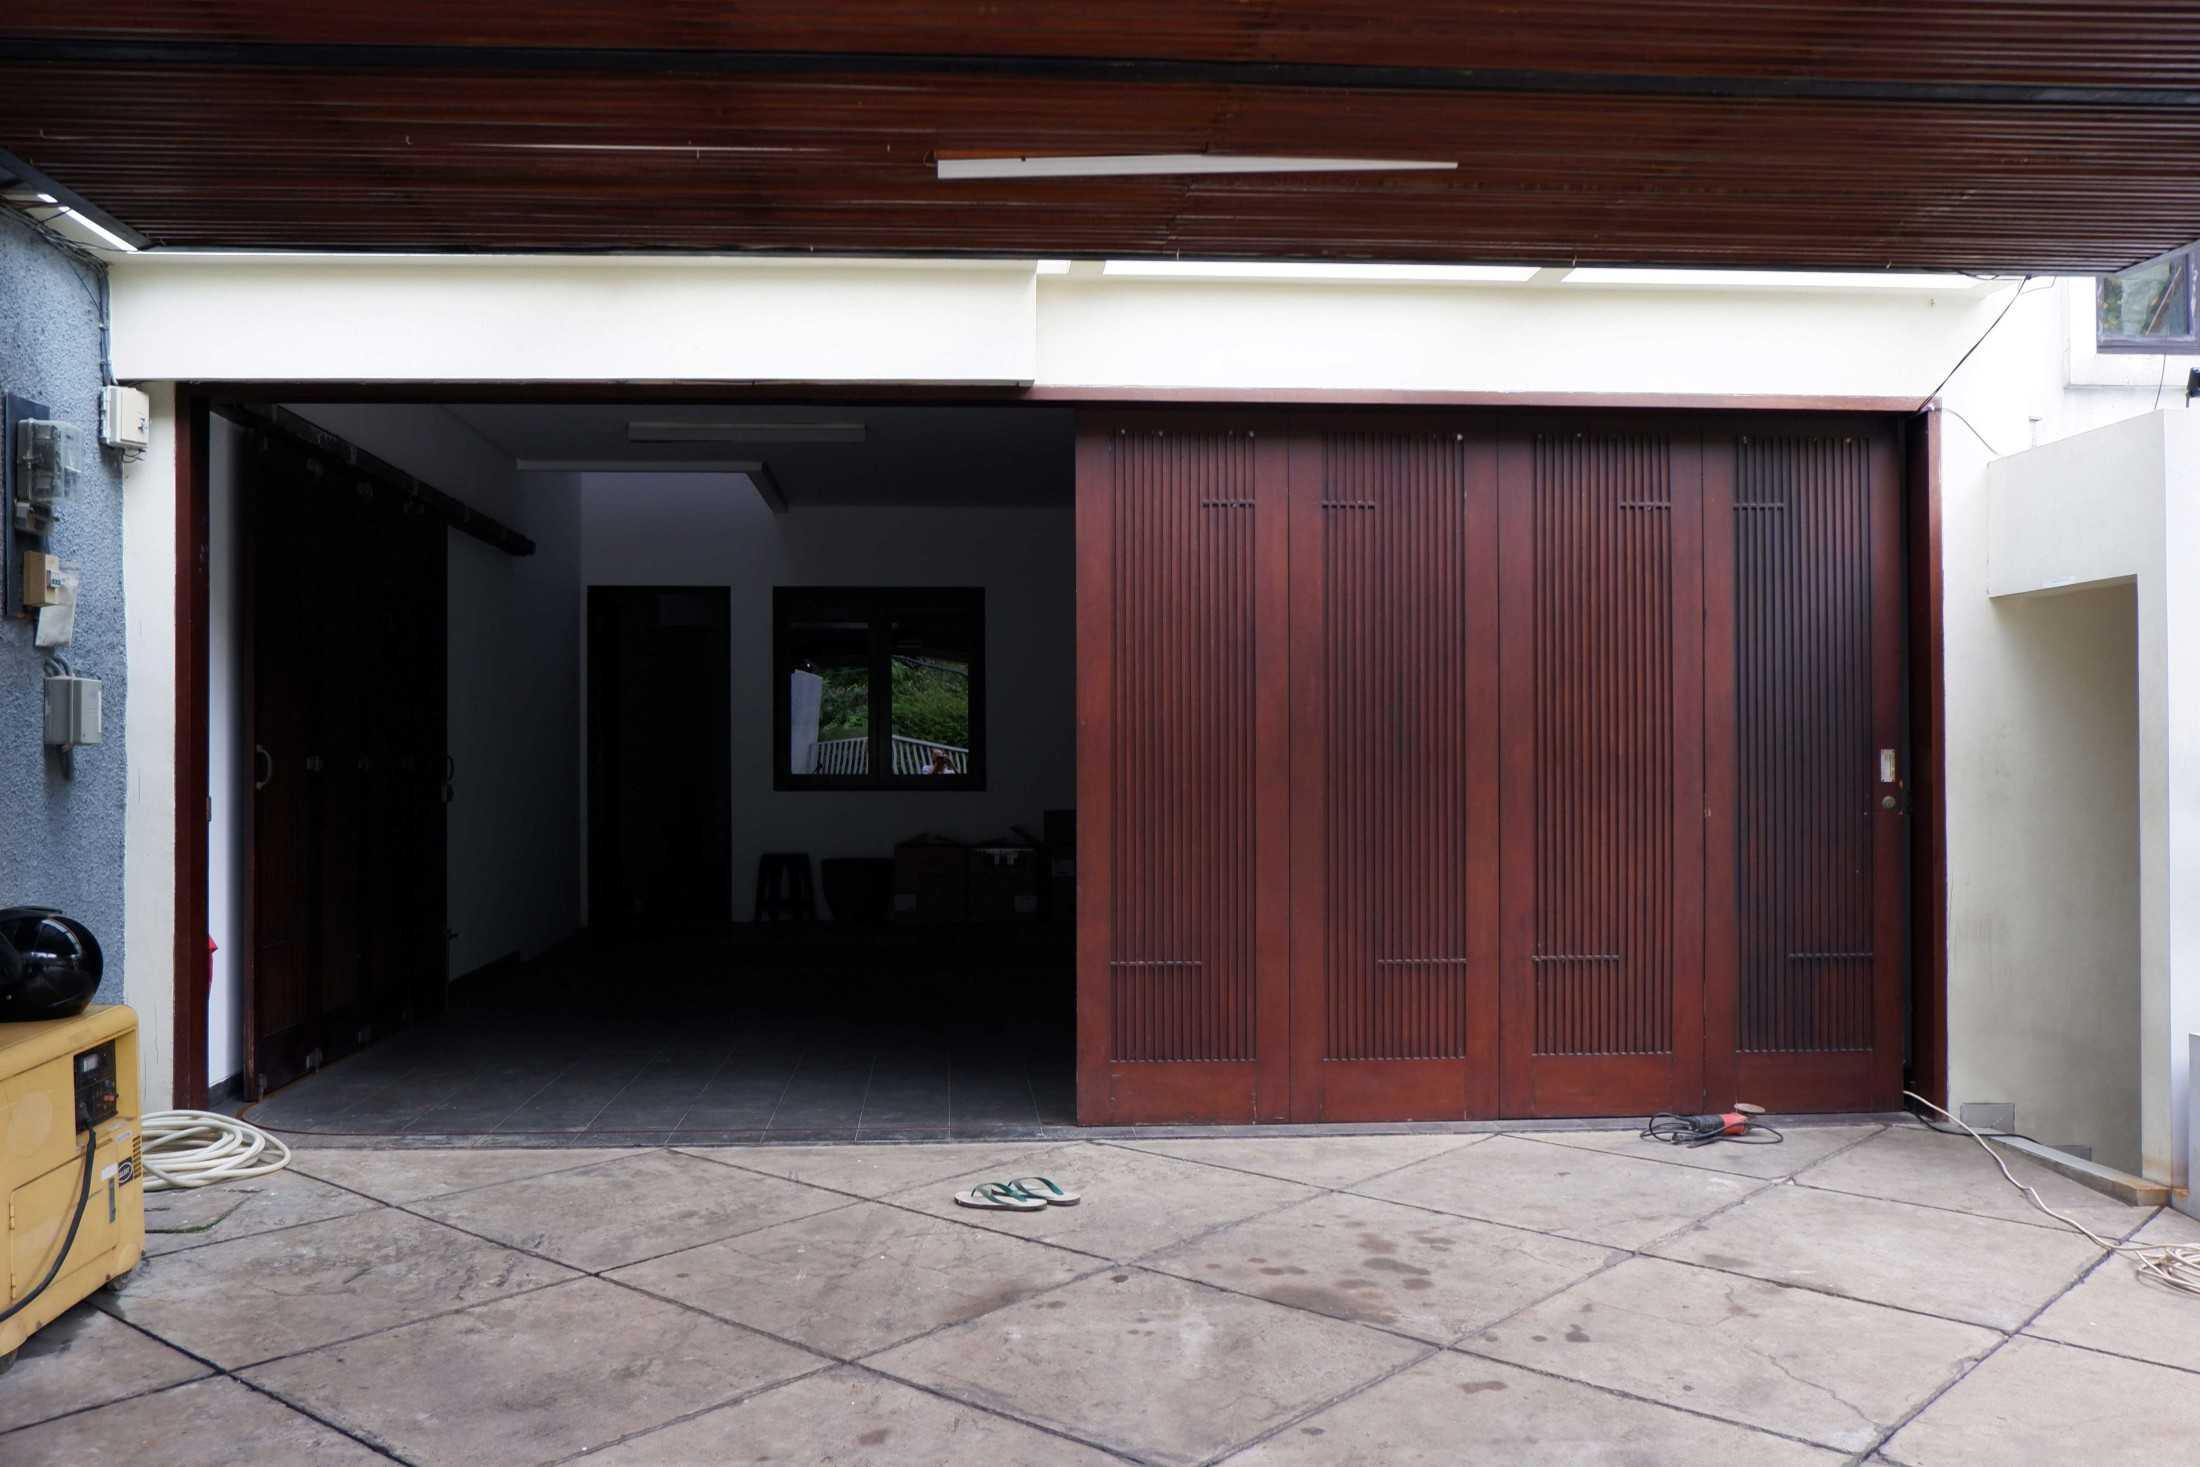 Lokative Studio Renovasi Rumah Cempaka Jakarta, Daerah Khusus Ibukota Jakarta, Indonesia Jakarta, Daerah Khusus Ibukota Jakarta, Indonesia Lokative-Studio-Renovasi-Rumah-Cempaka  97468